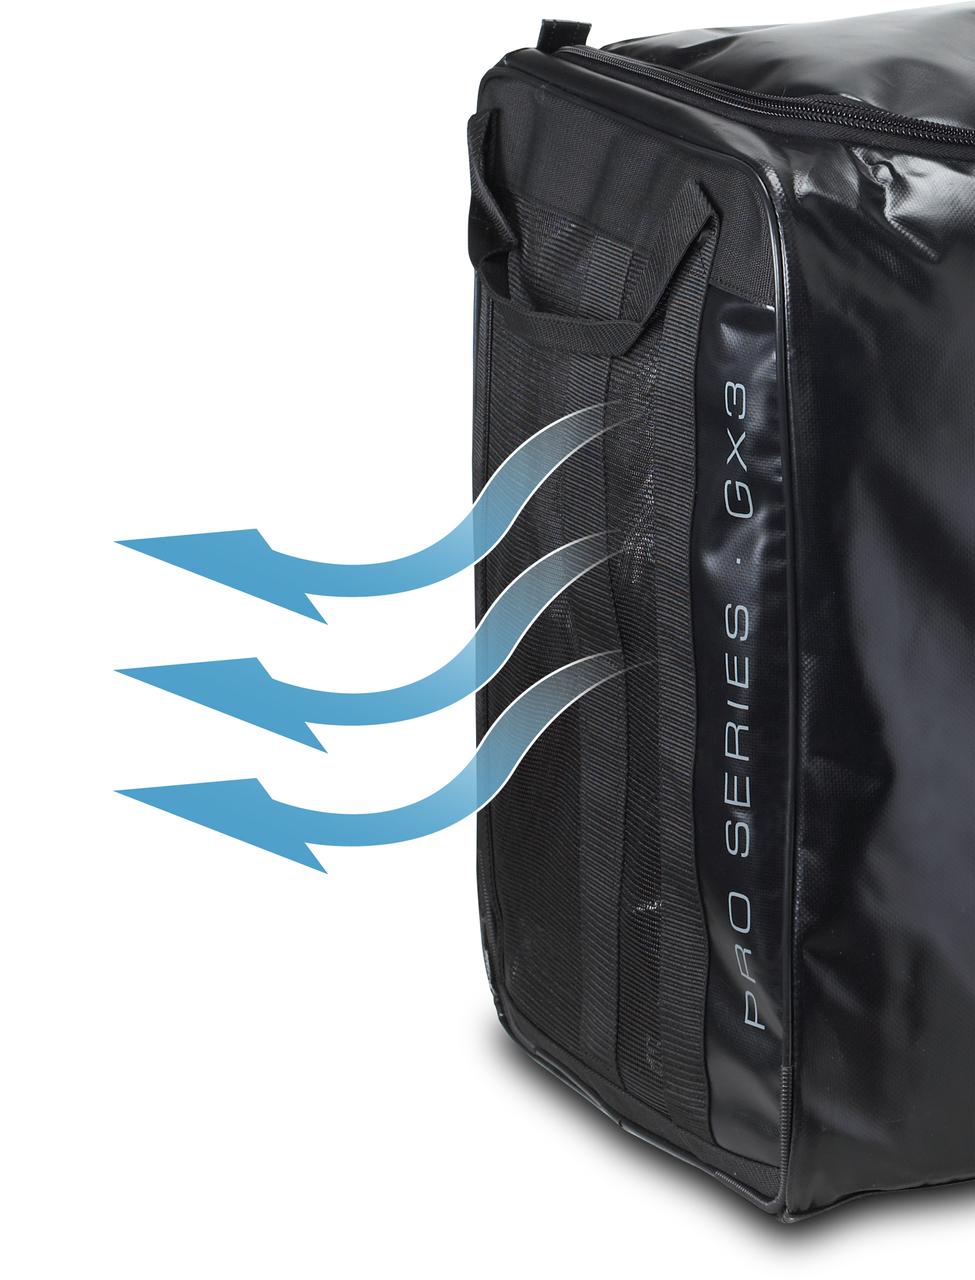 GX3 Pro Series Carry Bag